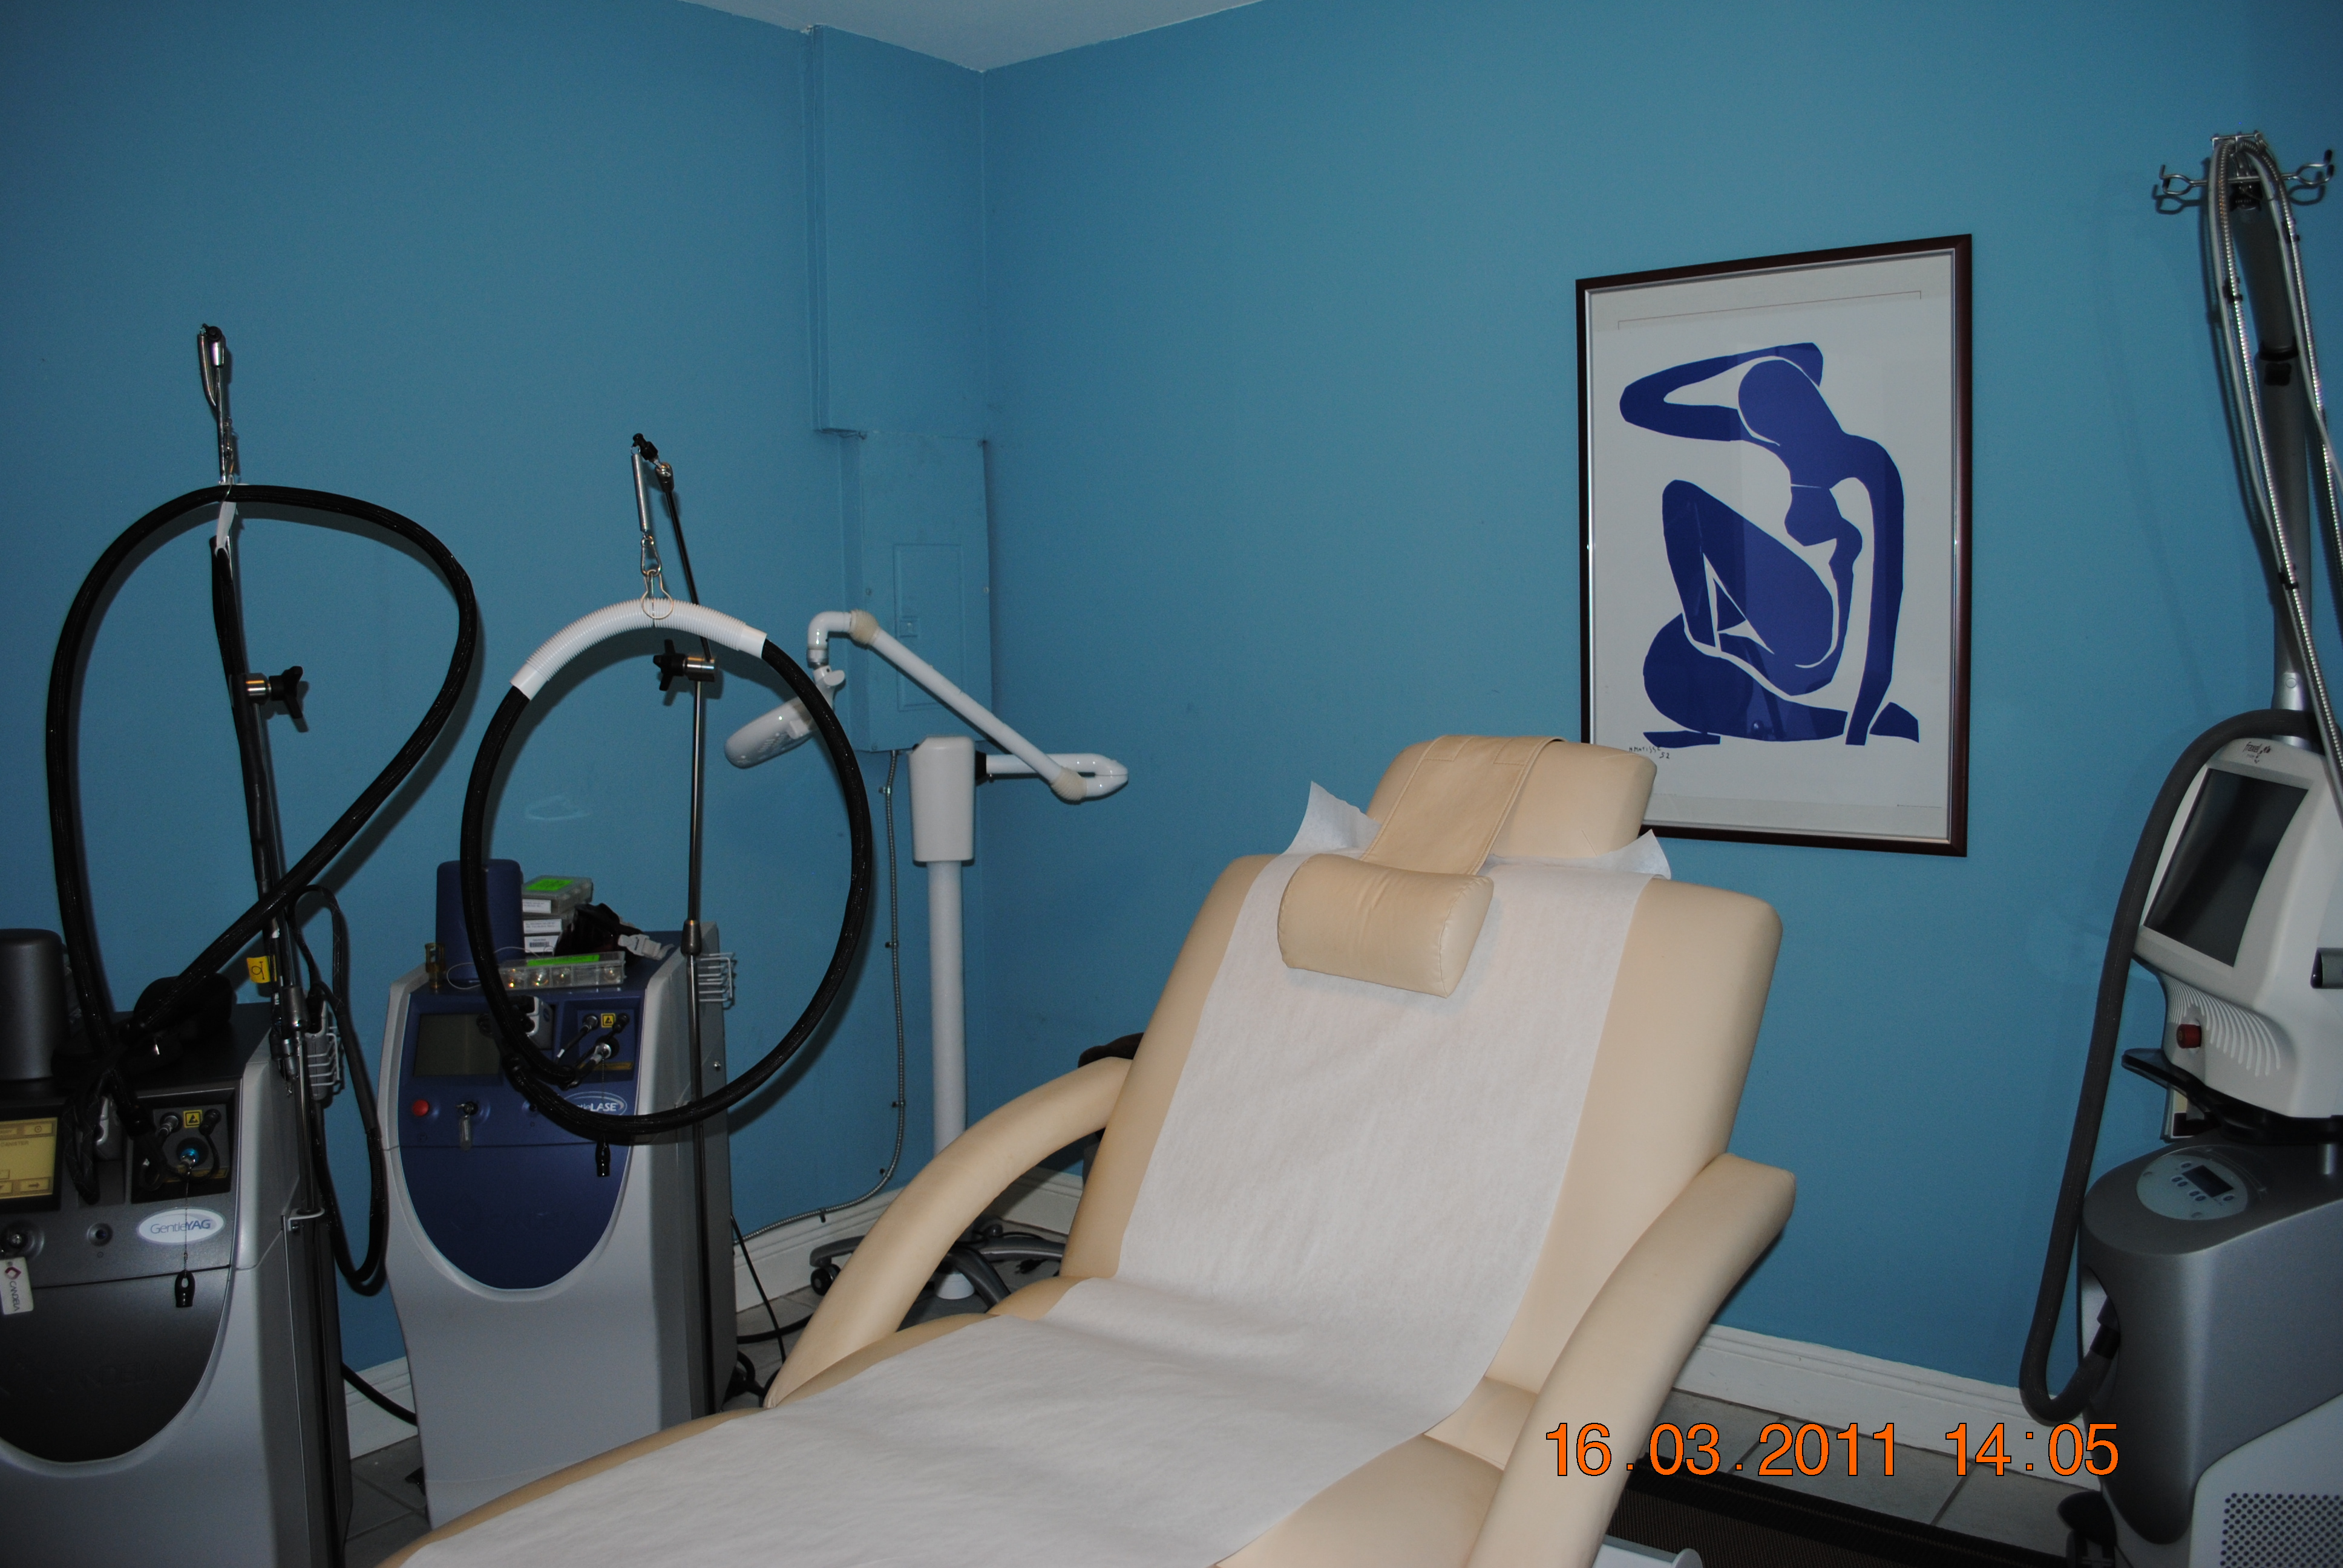 Wymore Laser & Anti-Aging Medicine in Winter Park, FL in